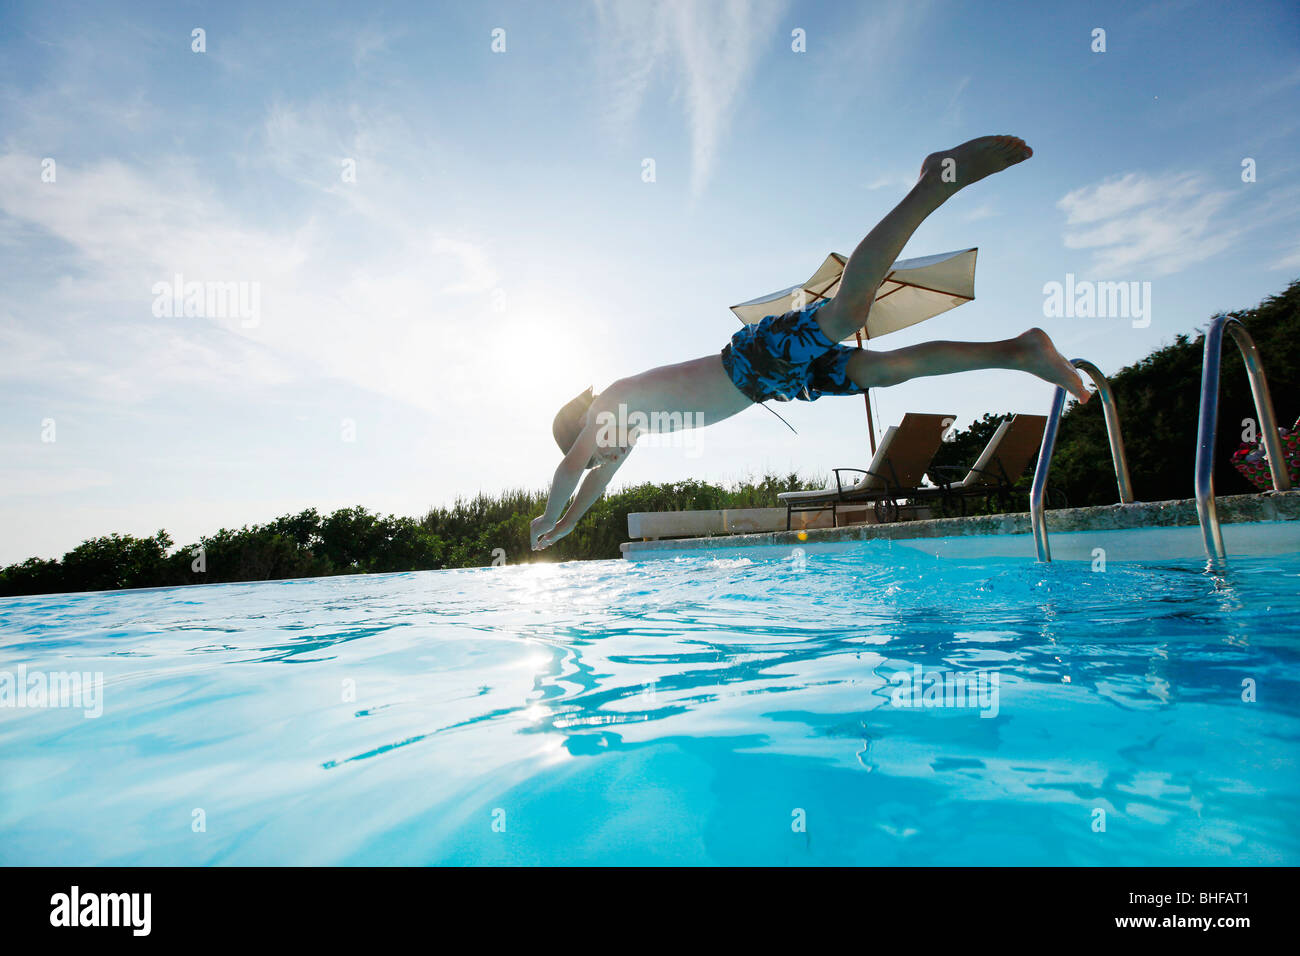 Ragazzo tuffarsi in piscina, pool, Las Dunas Playa, Formentera, isole Baleari, Spagna Foto Stock